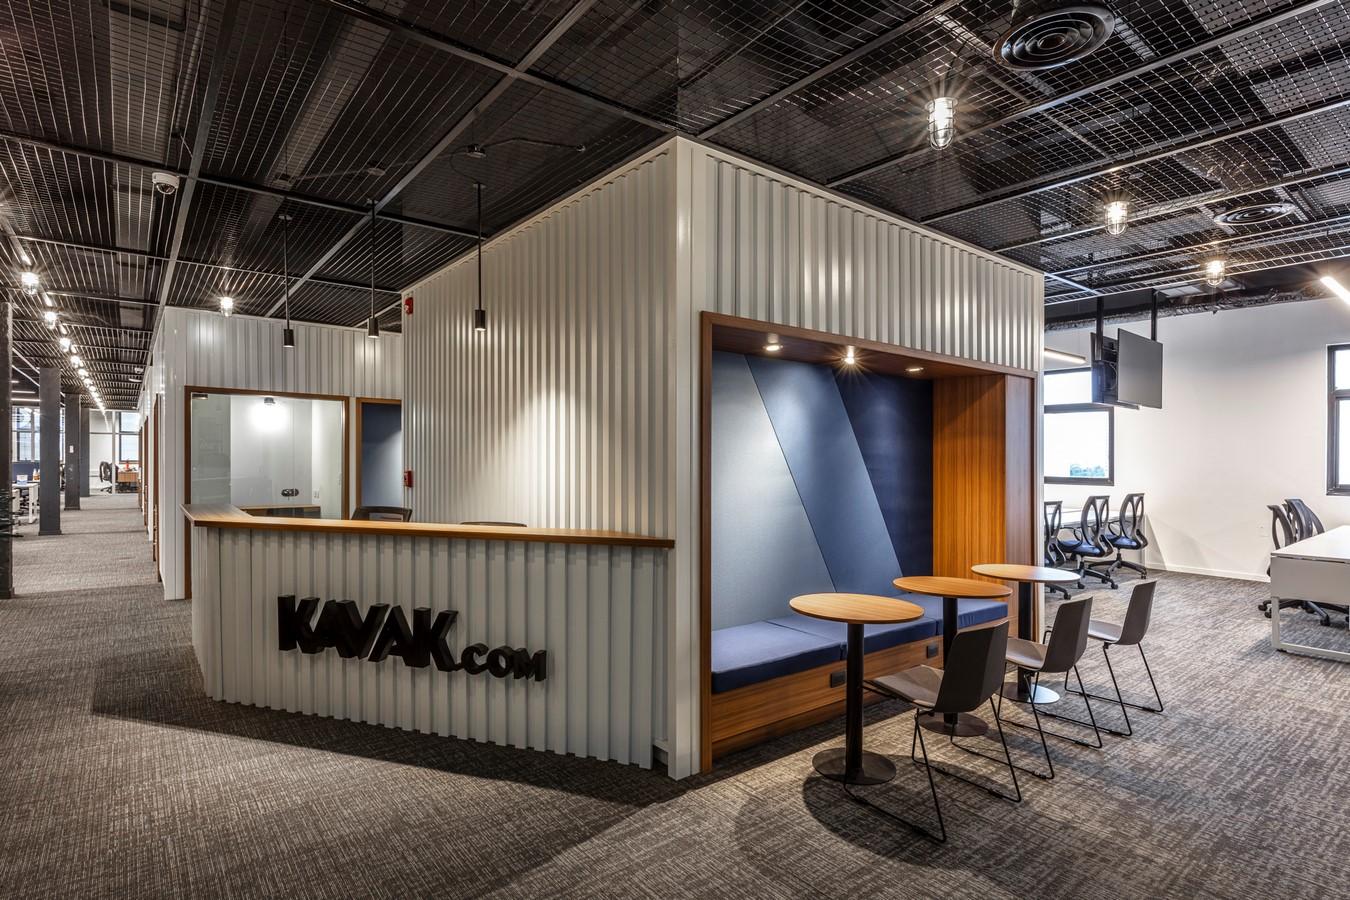 Kavak office by Hitzig Militello Architects - Sheet1